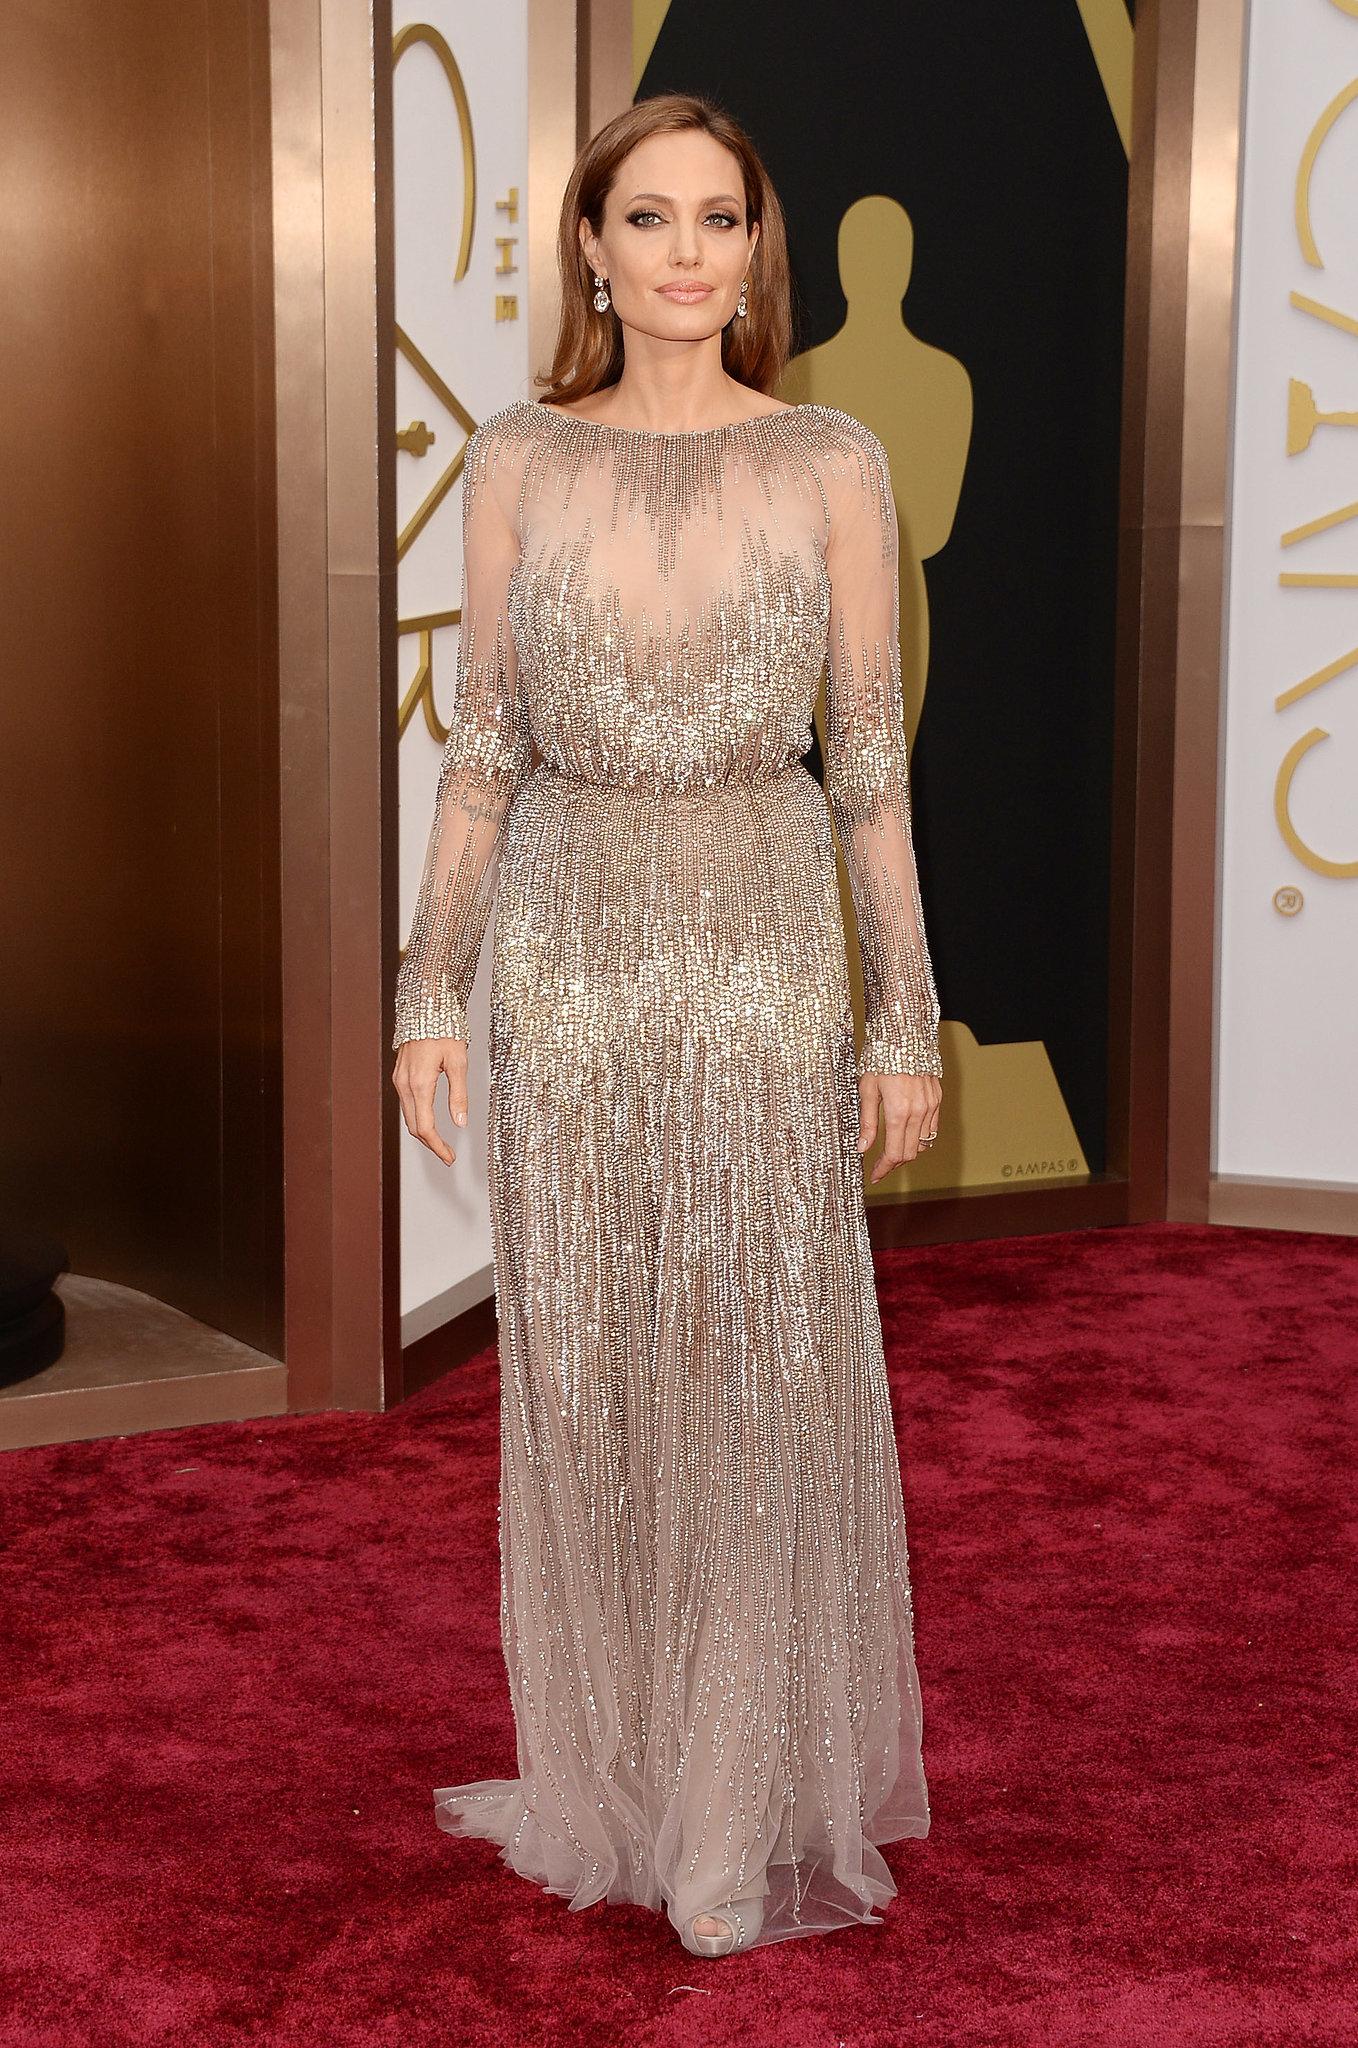 angelina-jolie-best-dressed-oscars-2014 Best Dressed Celebrities 2014 Oscars: The Best Dressed Celebrities angelina jolie best dressed oscars 2014